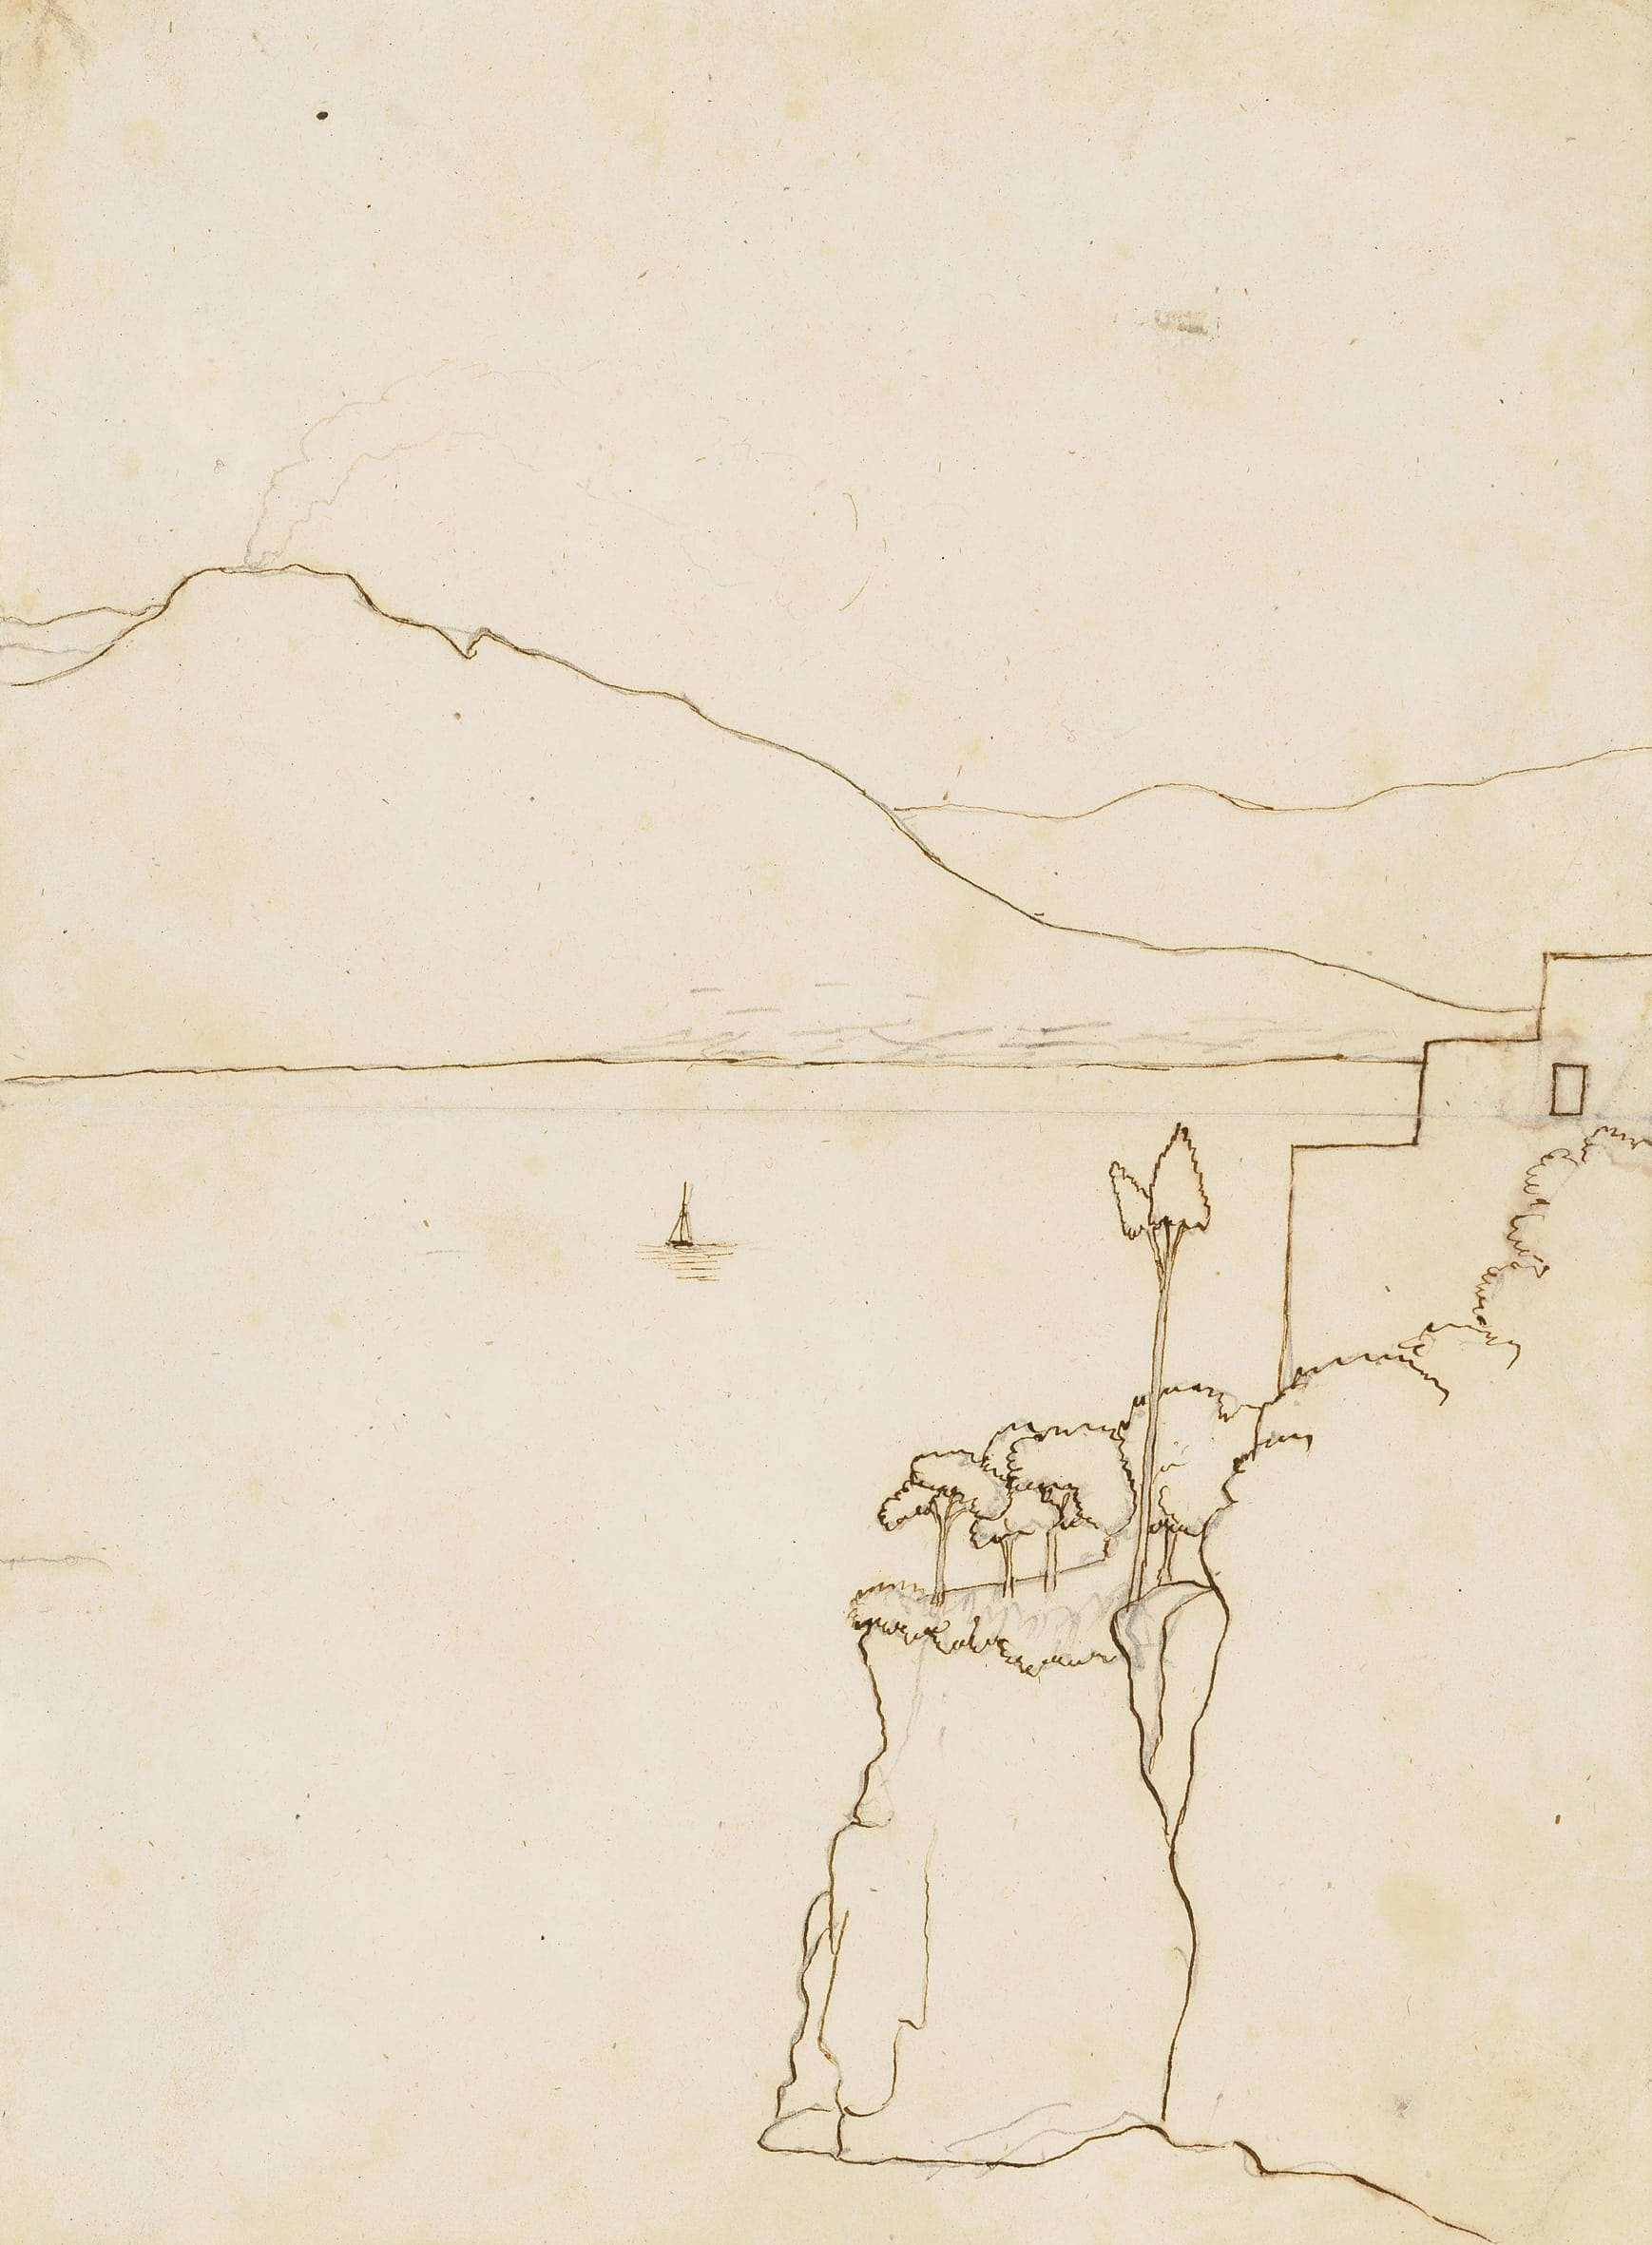 Hans Christian Andersen Der Vesuv, 1834 Feder, Bleistift Odense City Museums